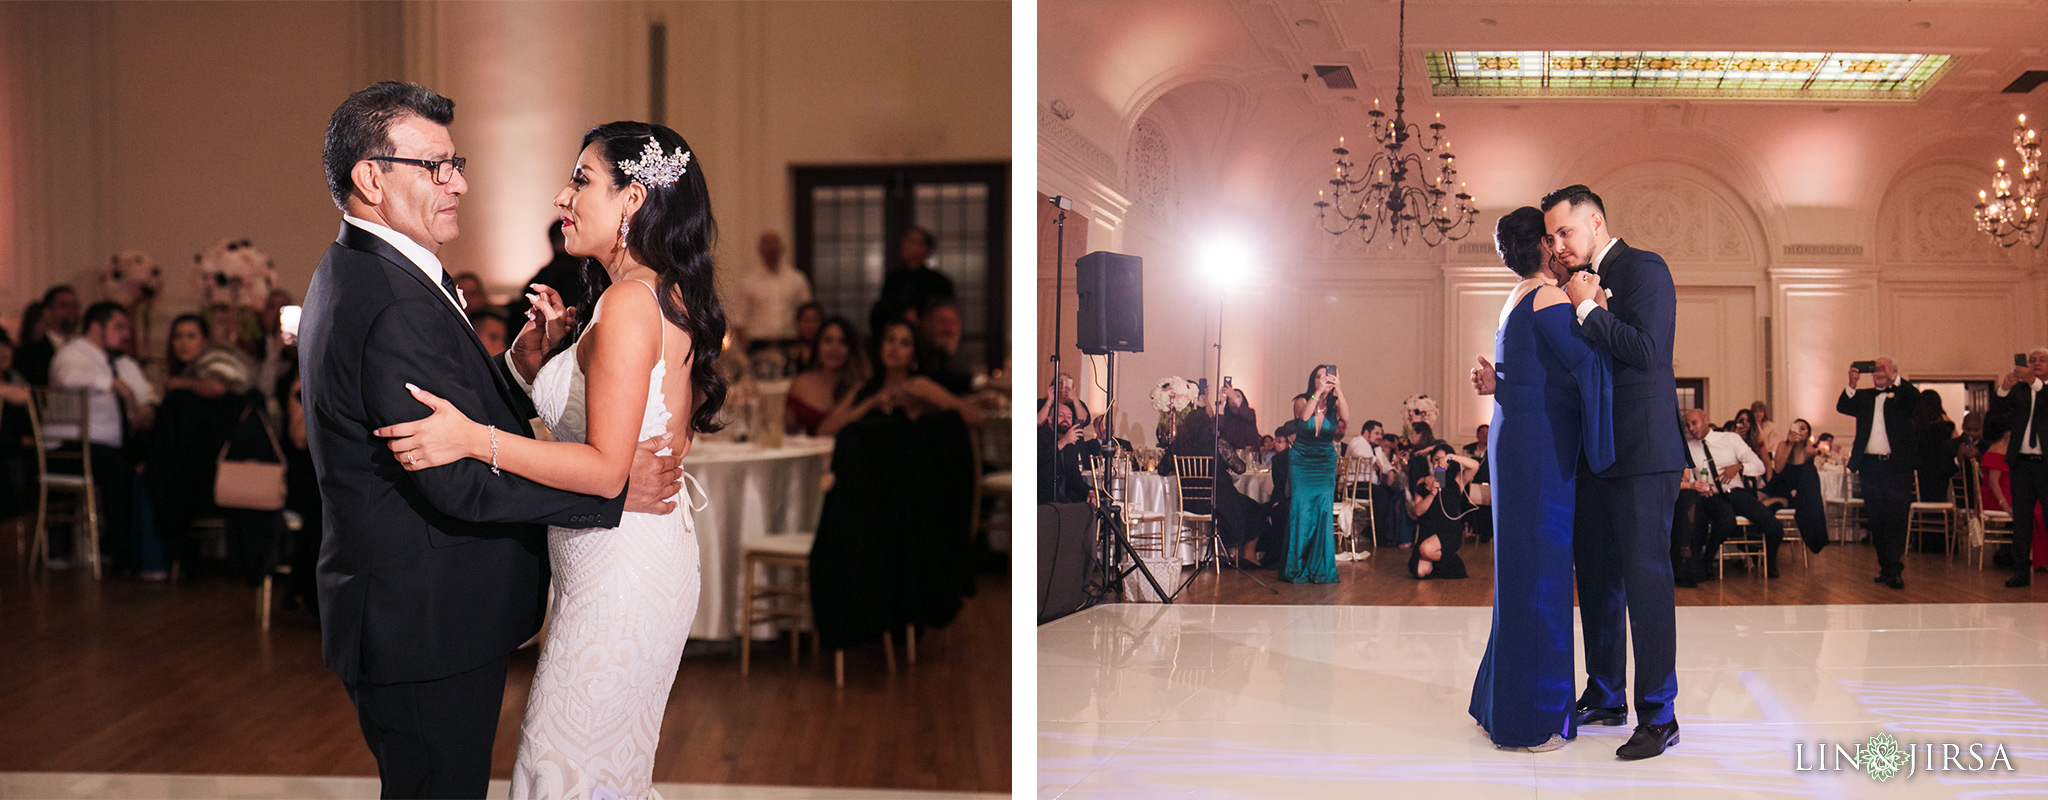 0803 Alexandria Ballroom Los Angeles County Wedding Photography